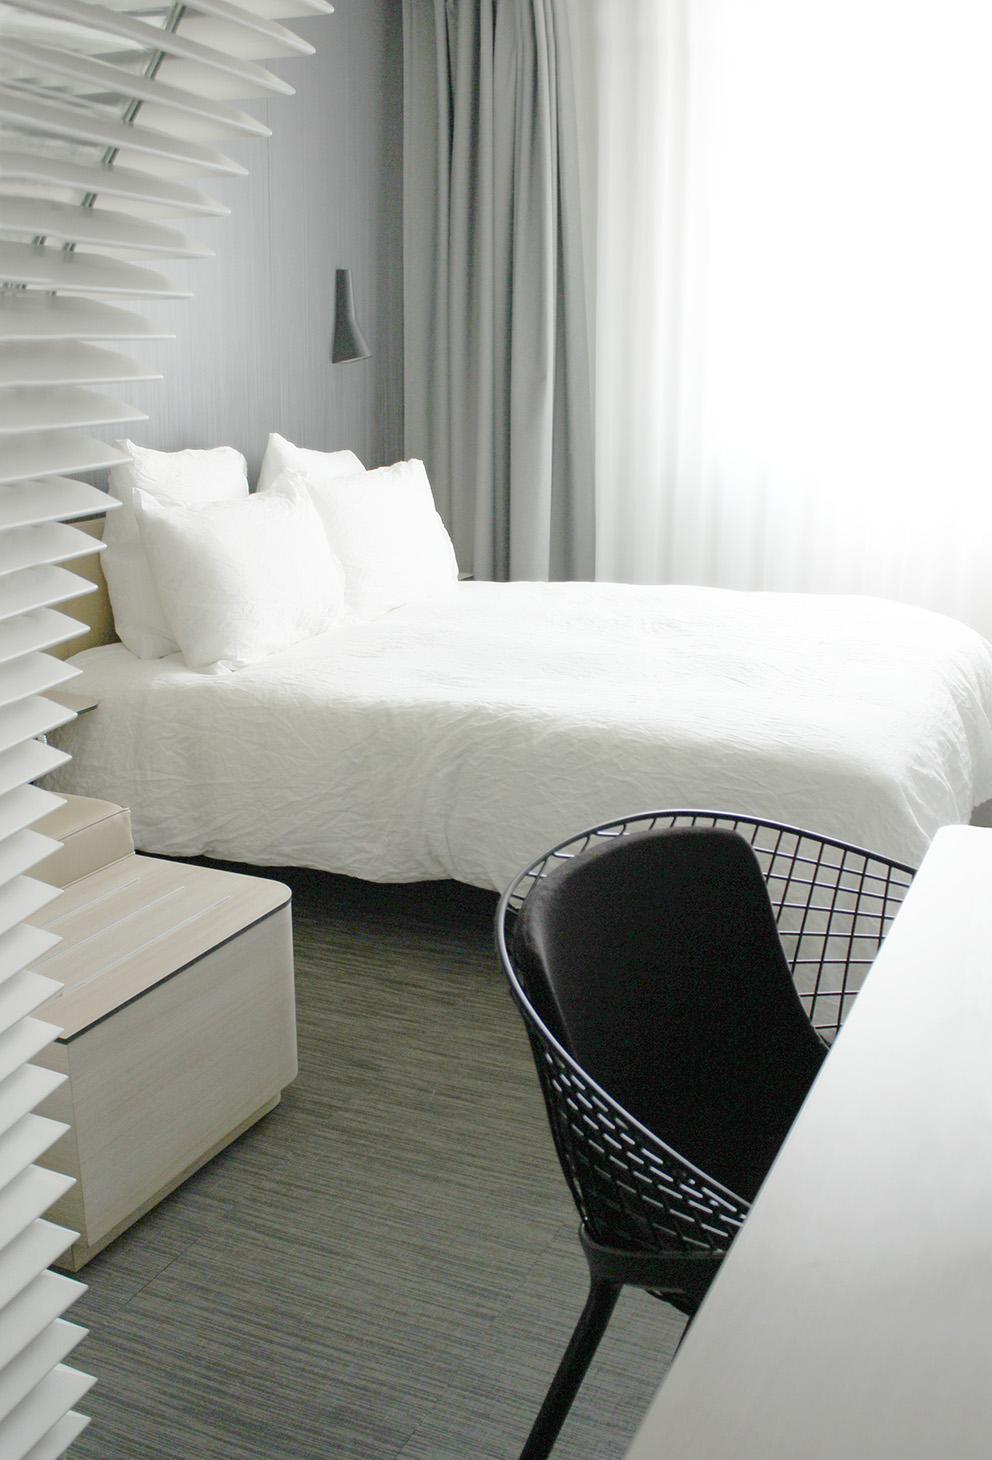 bel hotel cannes OKKO